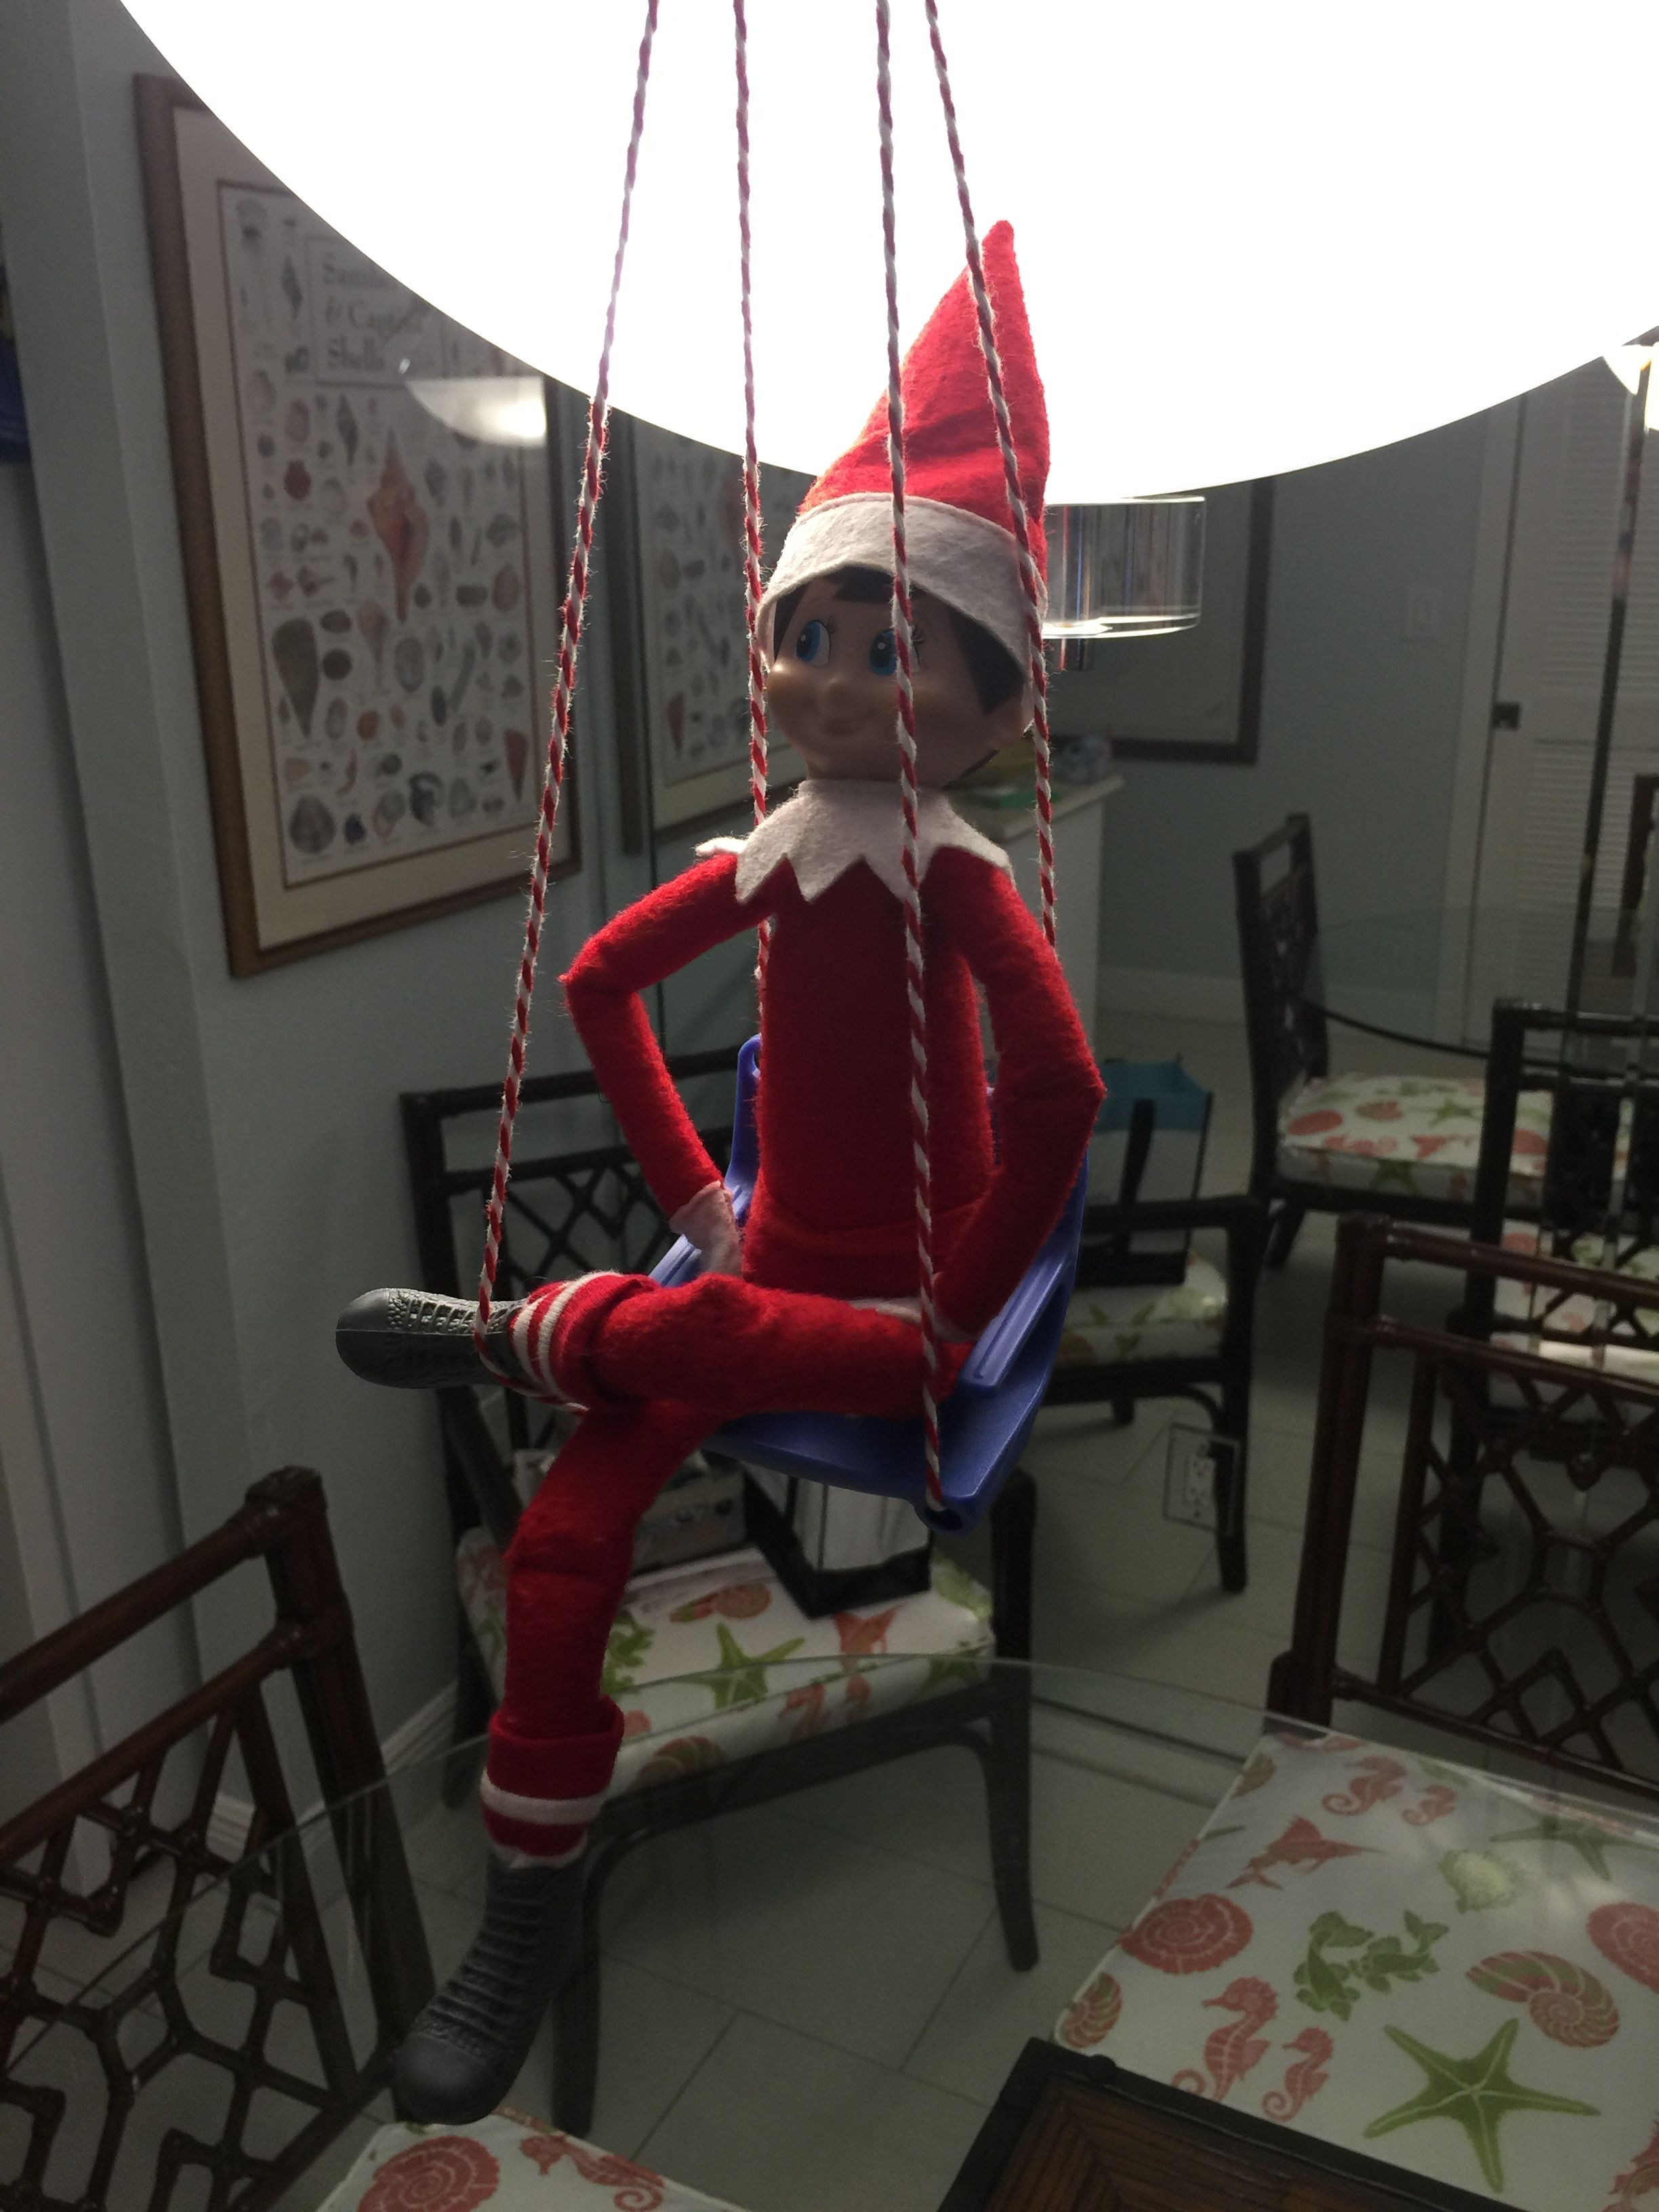 Elf on Shelf swing | Elf on the Shelf | Pinterest